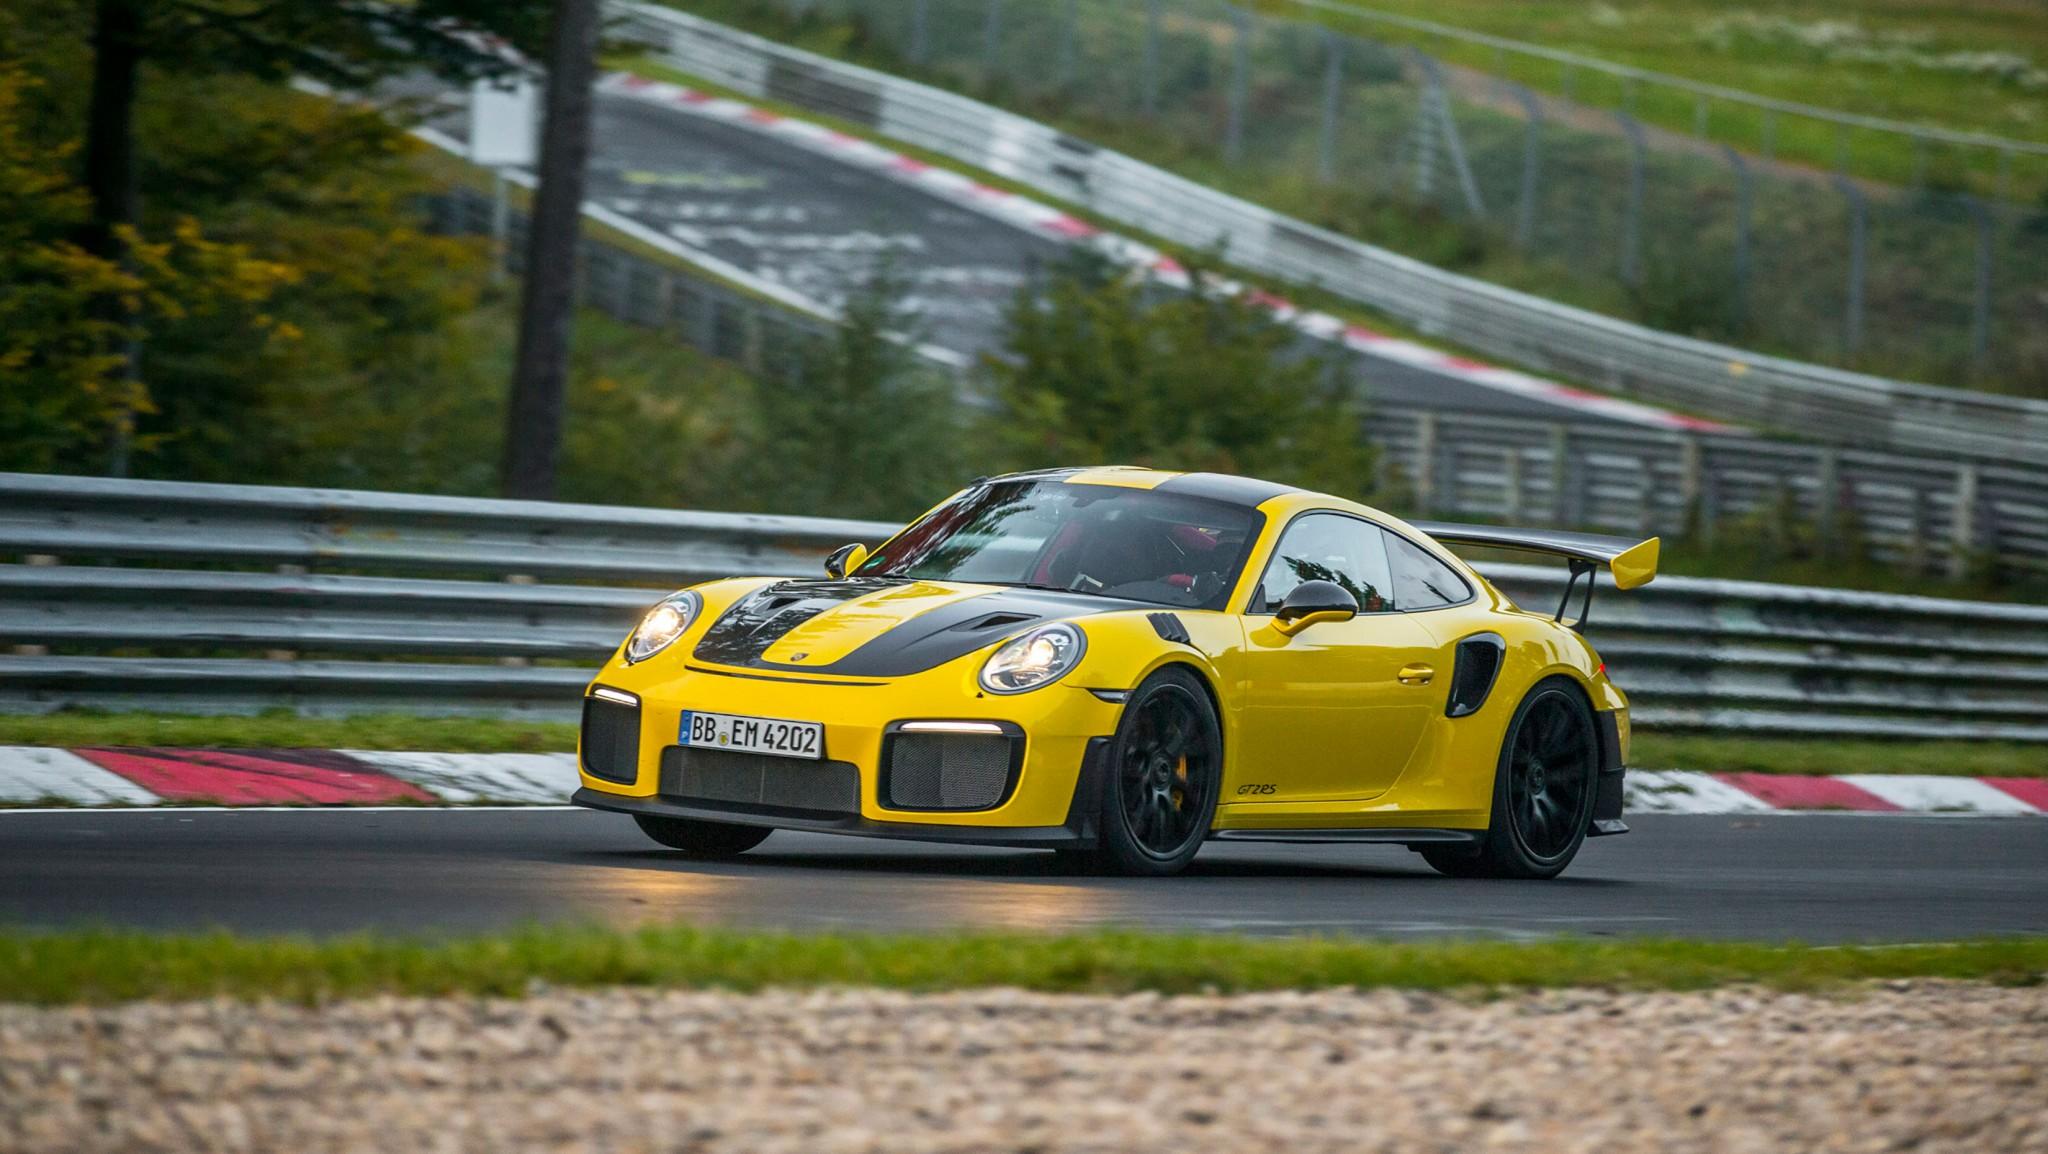 high_911_gt2_rs_world_record_nürburgring_2017_porsche_ag (4)